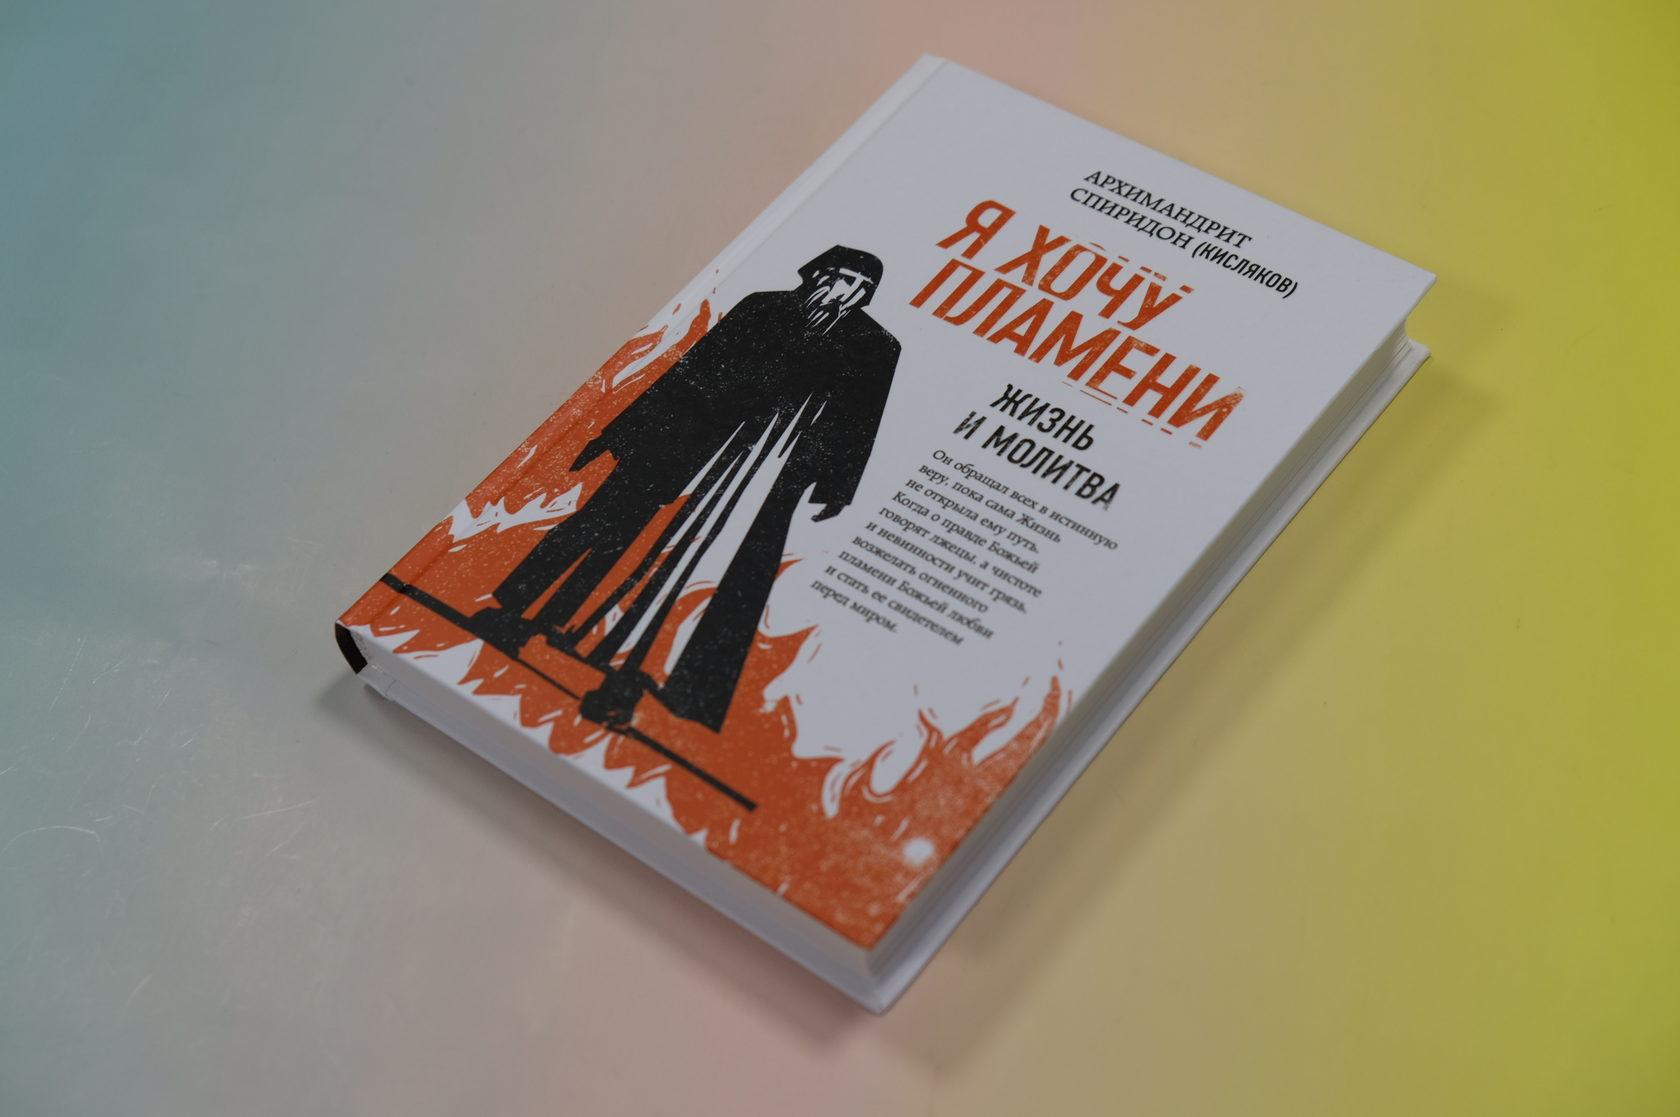 Купить книгу Архимандрит Спиридон (Кисляков) «Я хочу пламени. Жизнь и молитва»